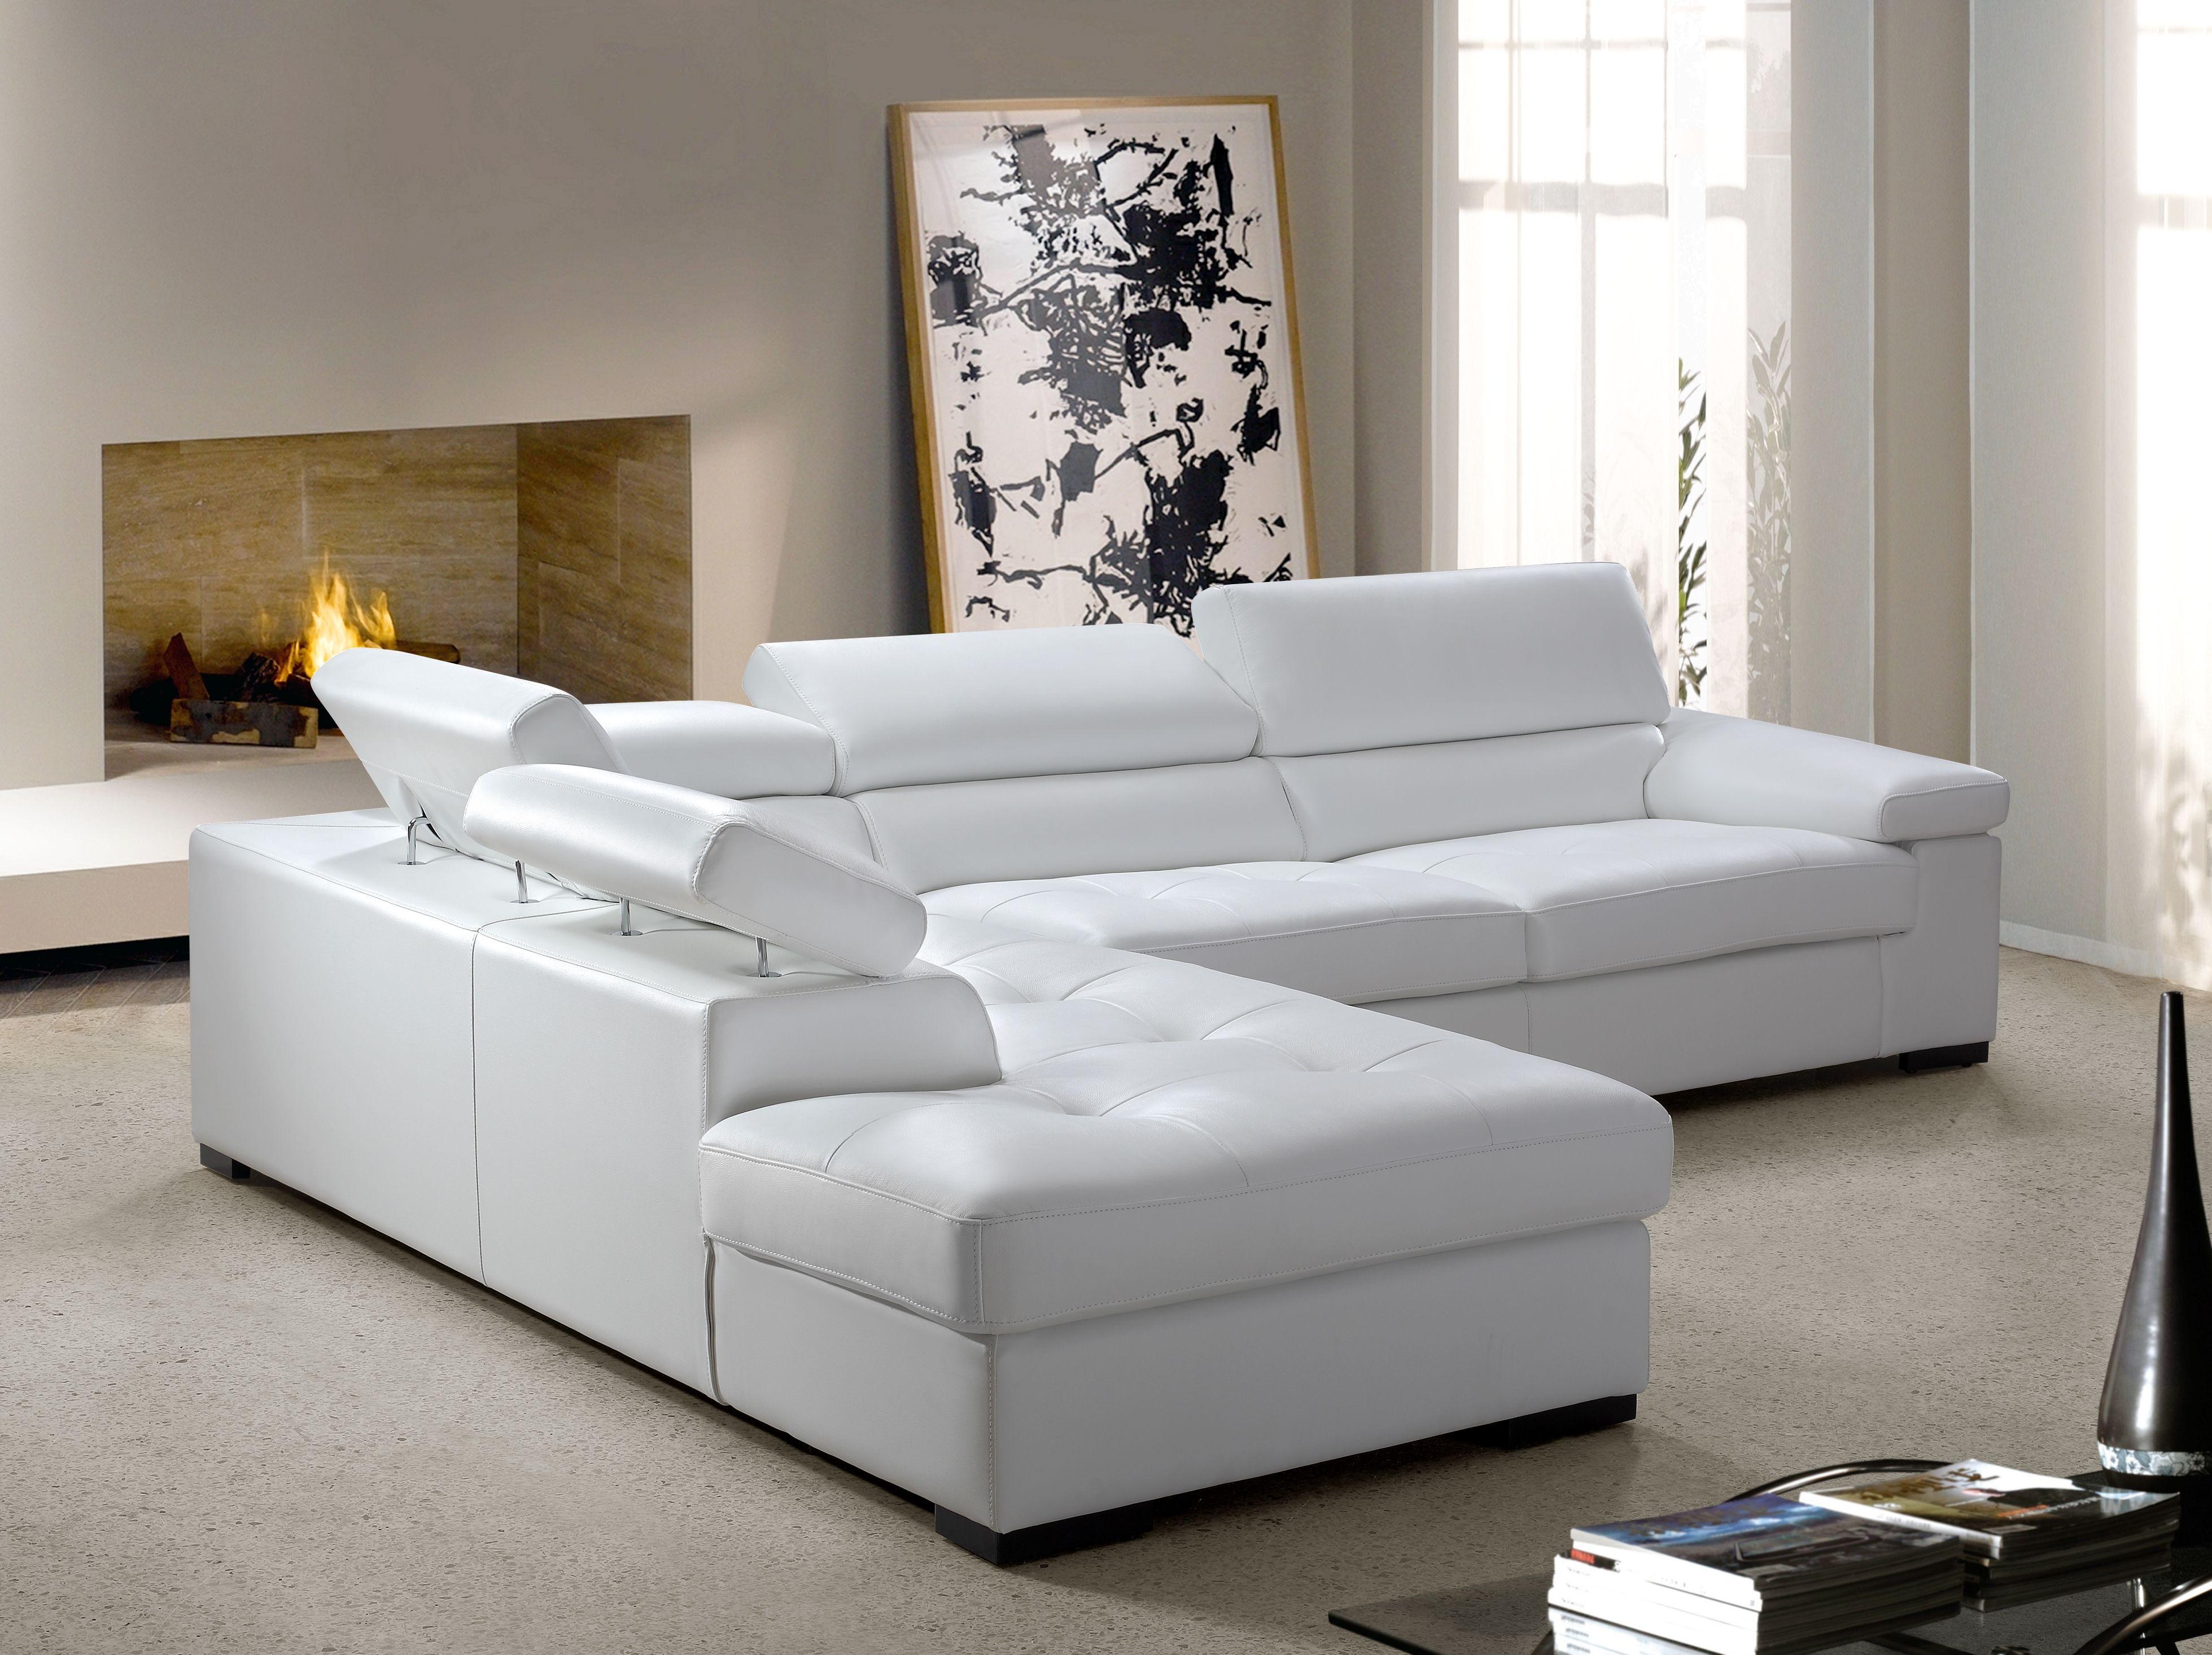 Buy Anna Leather Corner Sofa Online in London, UK ...